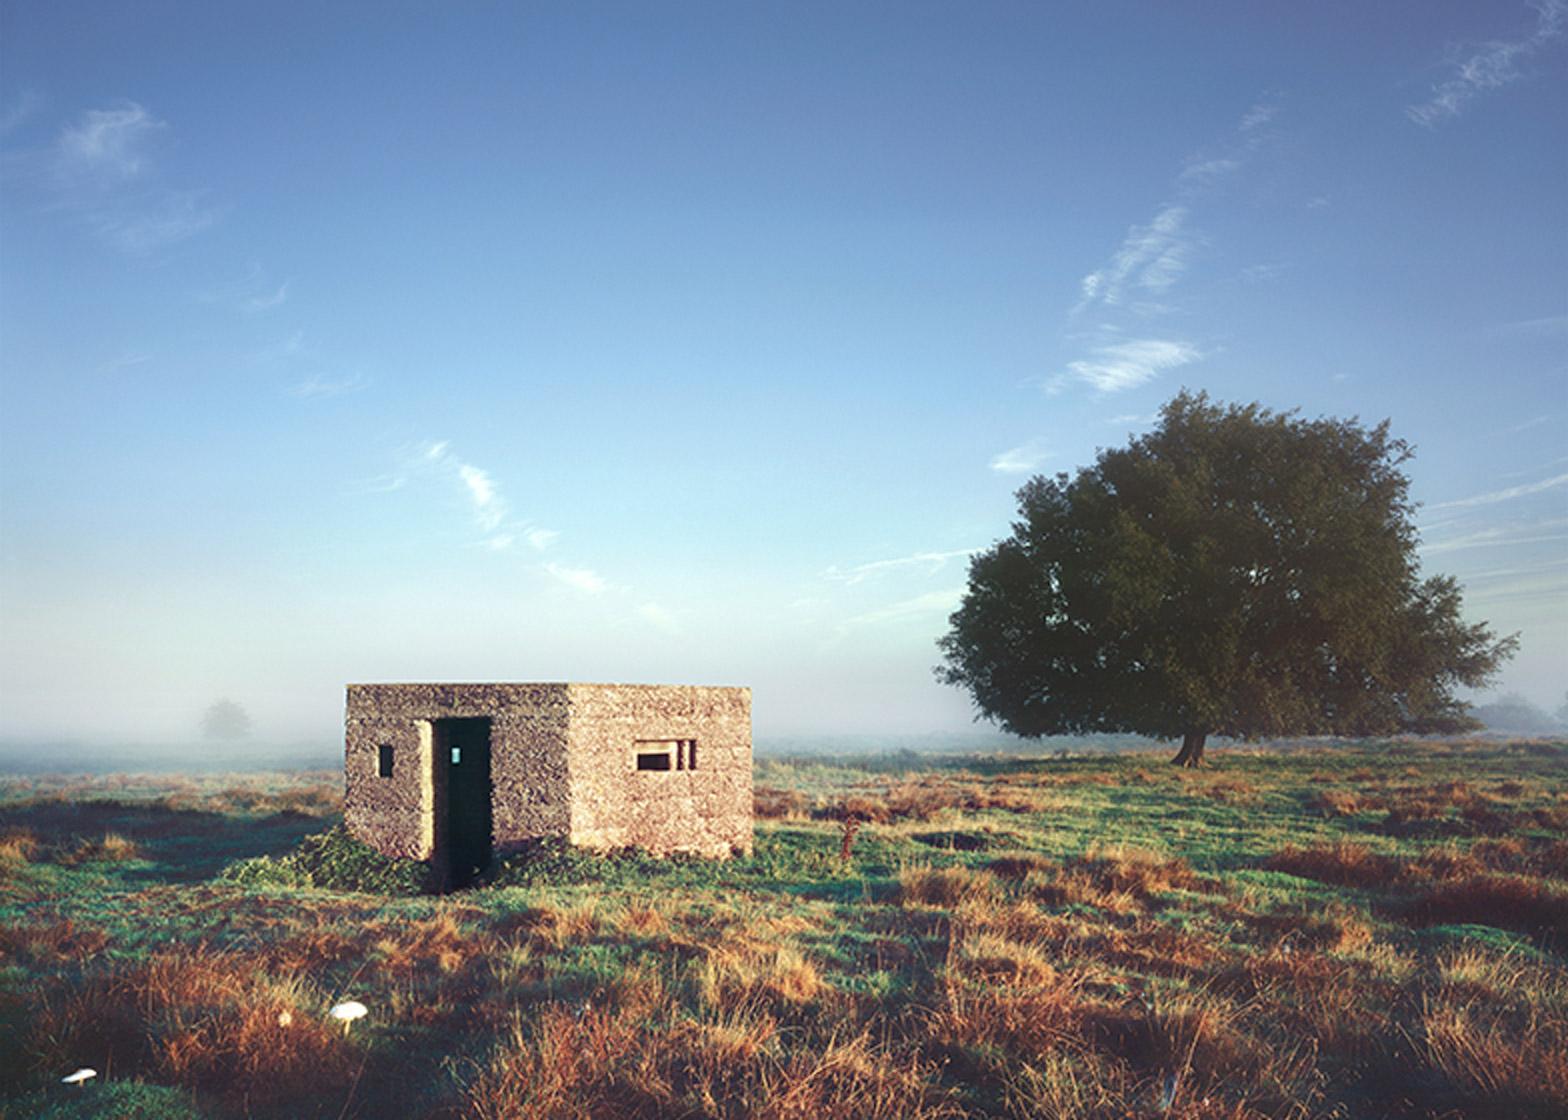 Defensive Structures in the British Landscape by Richard Brine